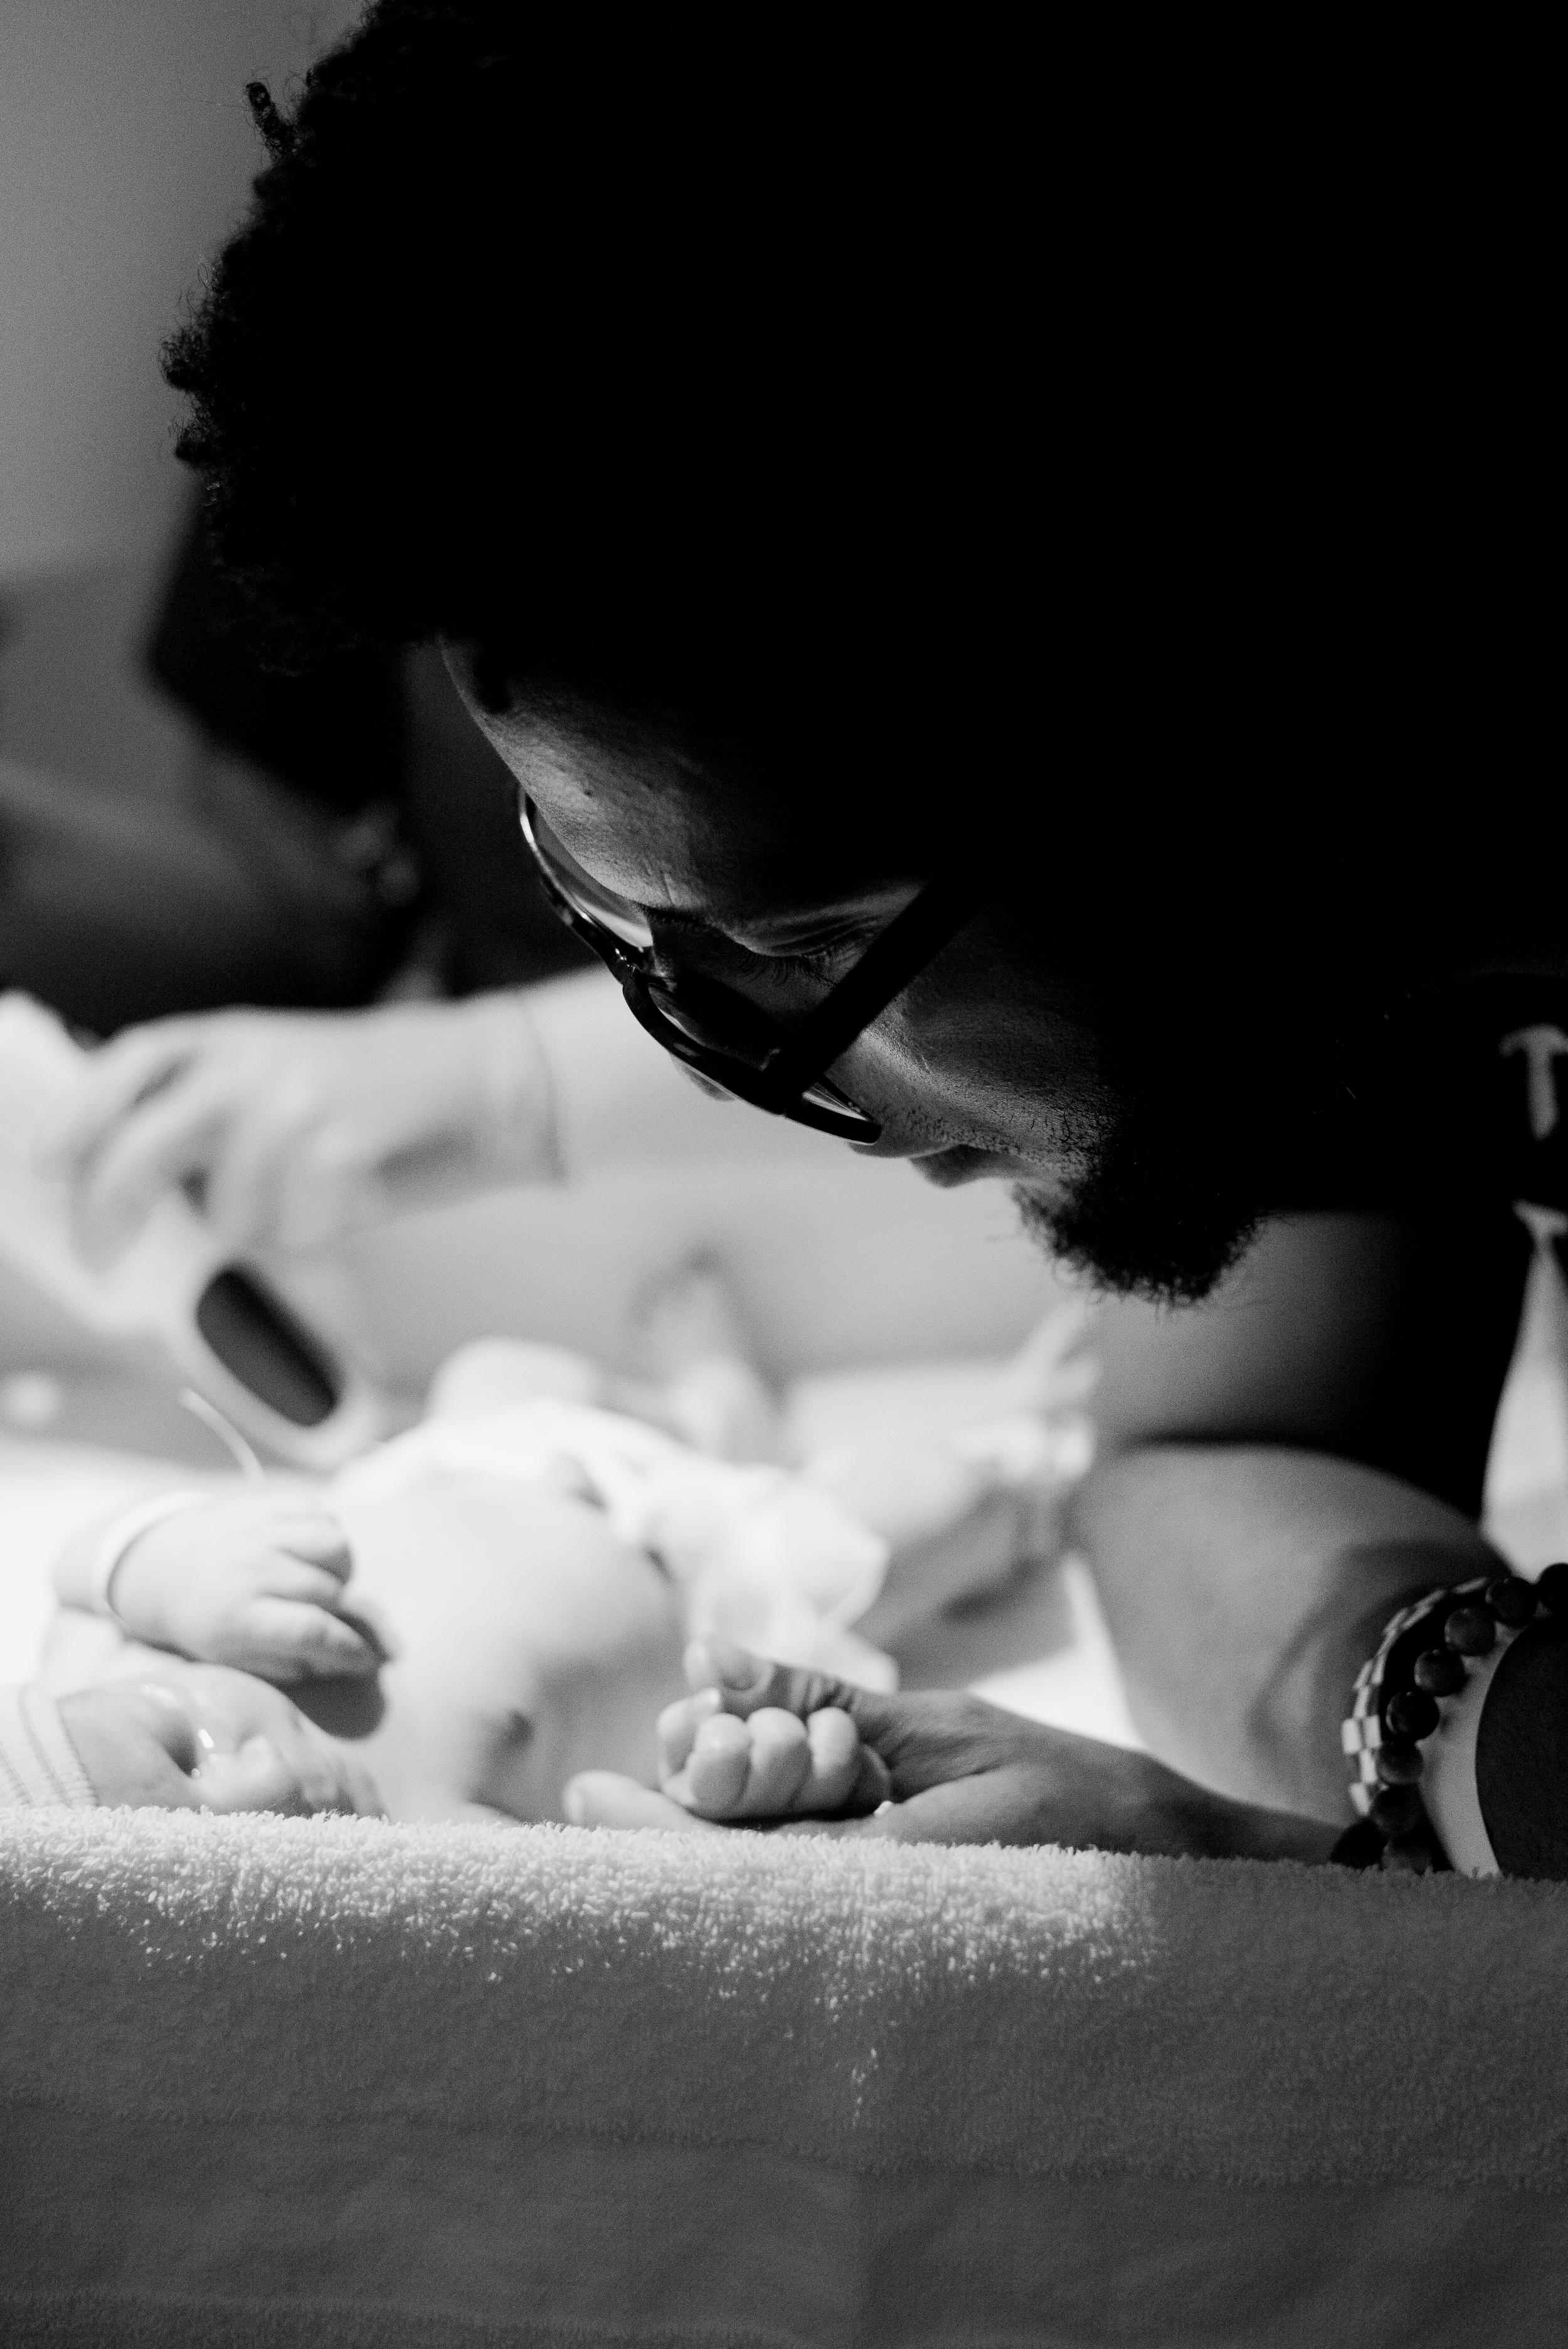 HBirth - Birth - Leesburg, VA - Birth Photography - Fresh 48 - Aimee Durrance Photography-816.jpg